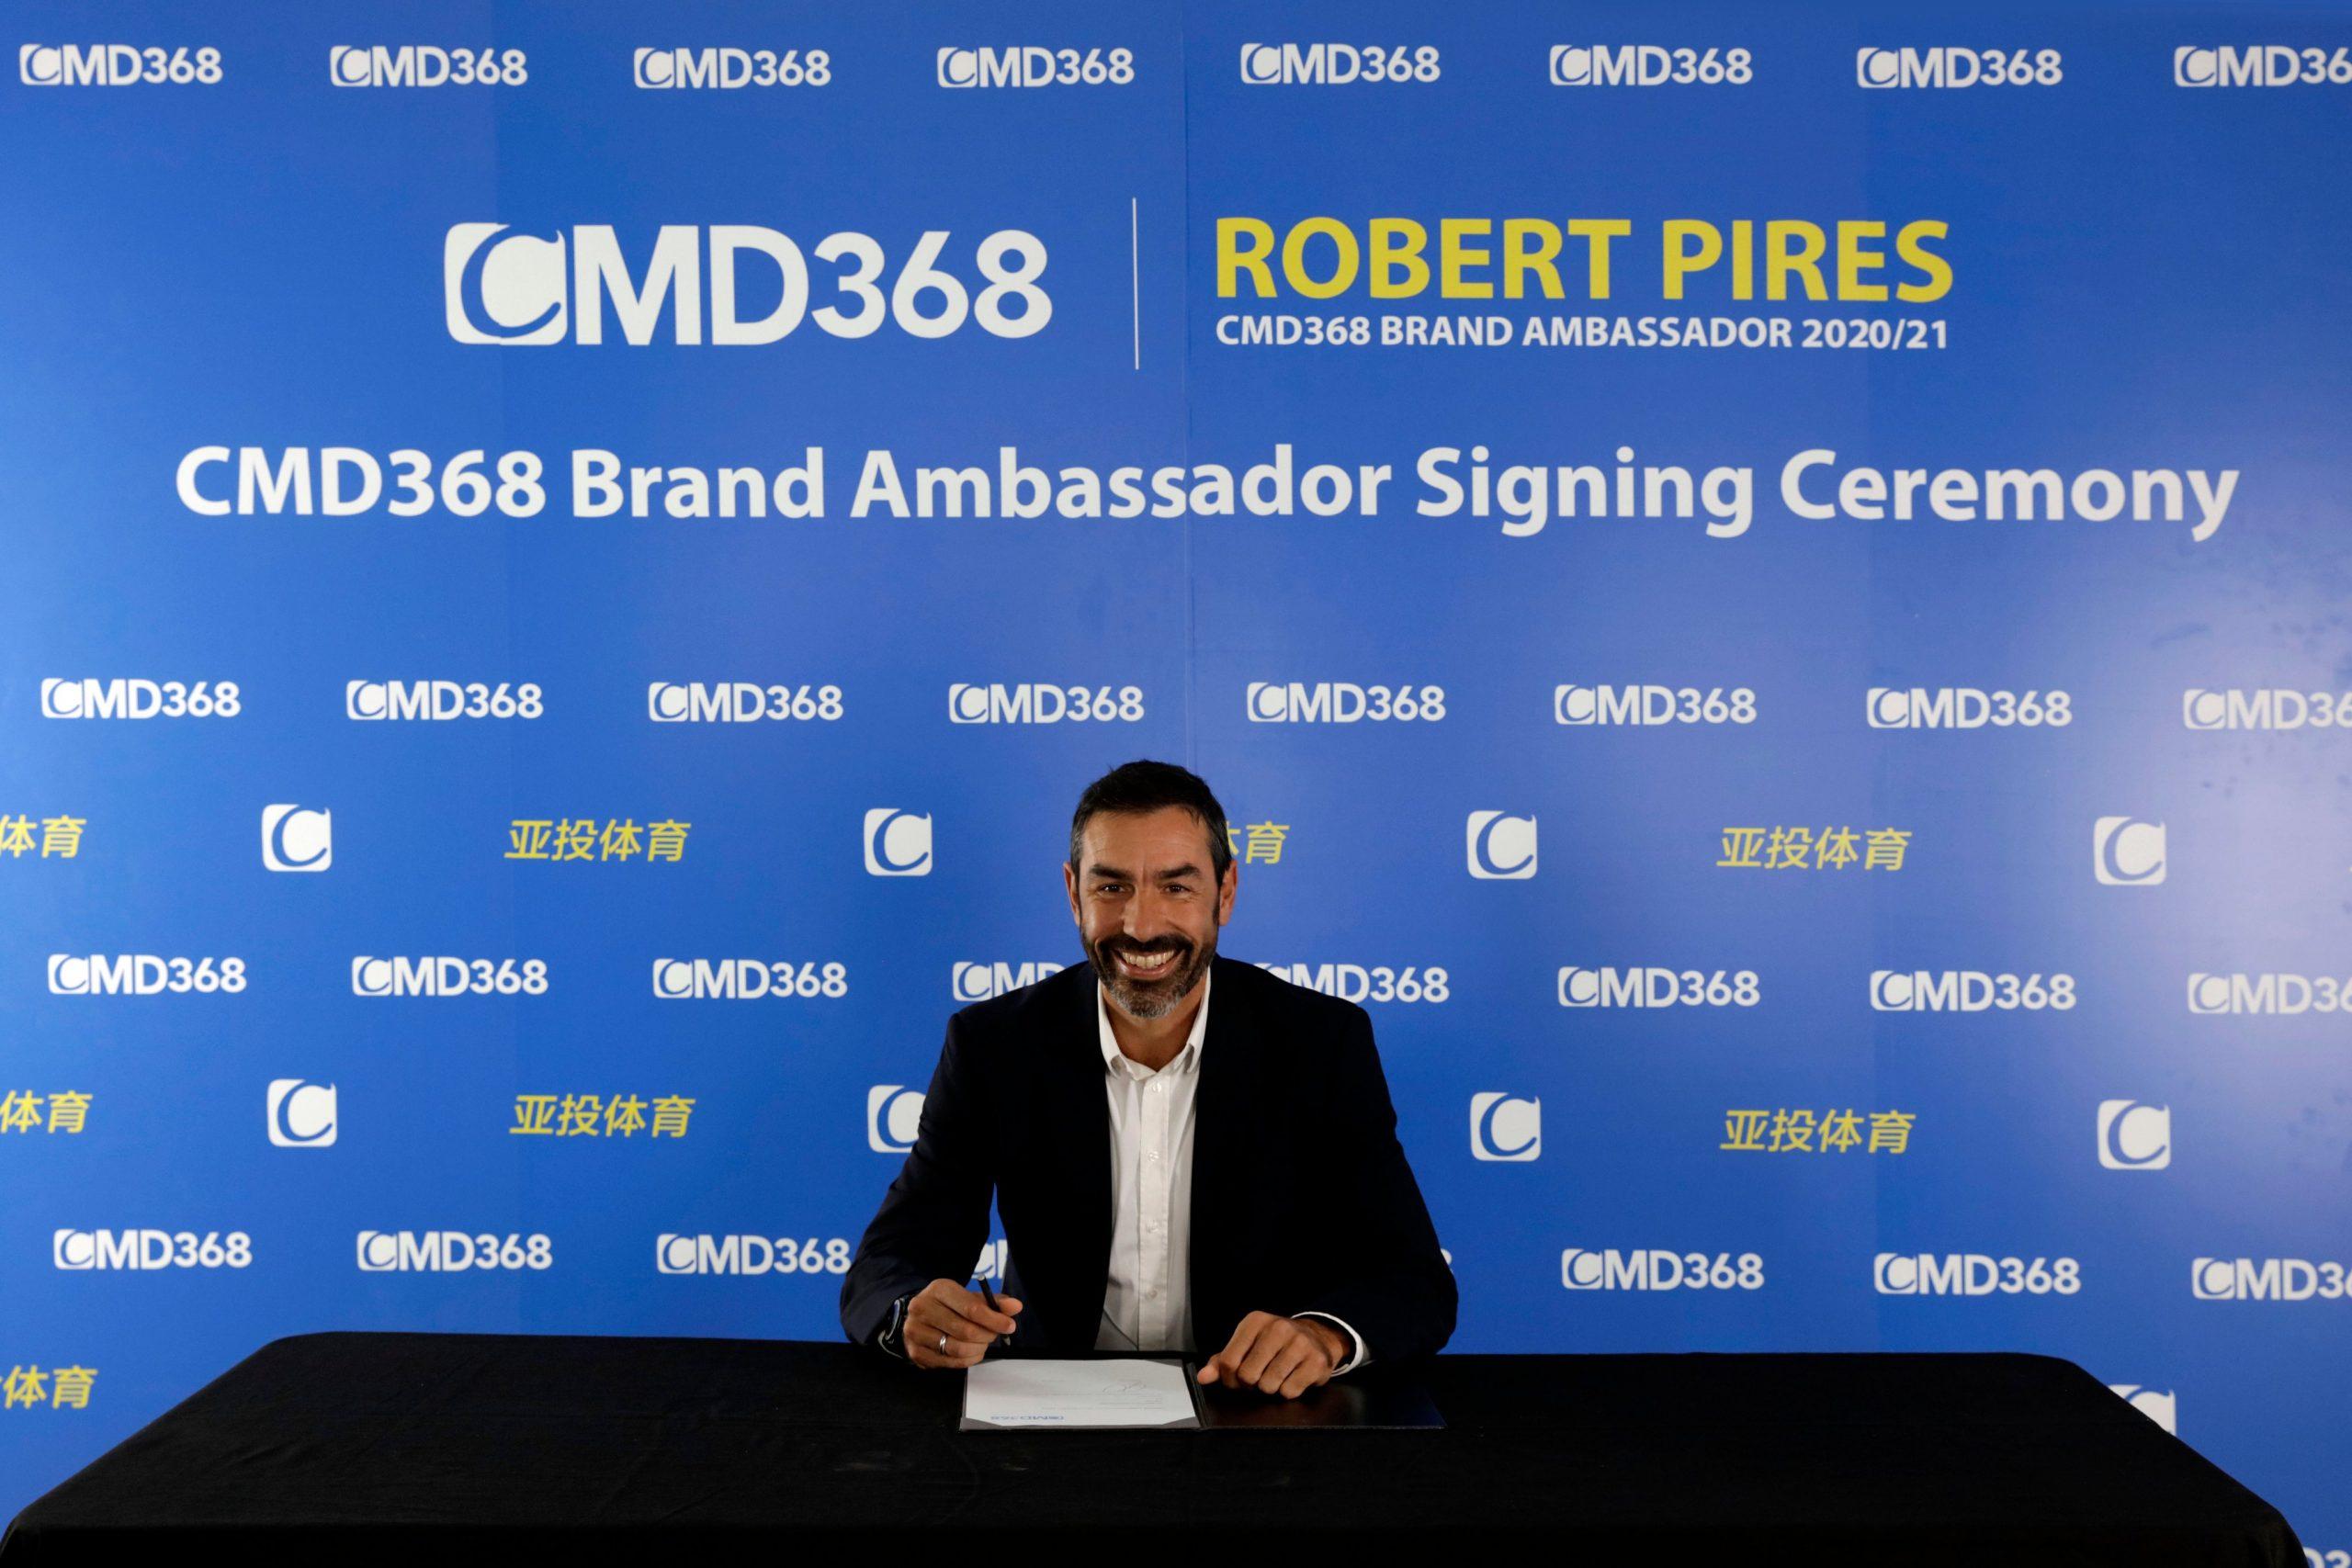 Robert Pires Joins CMD368 As Ambassador